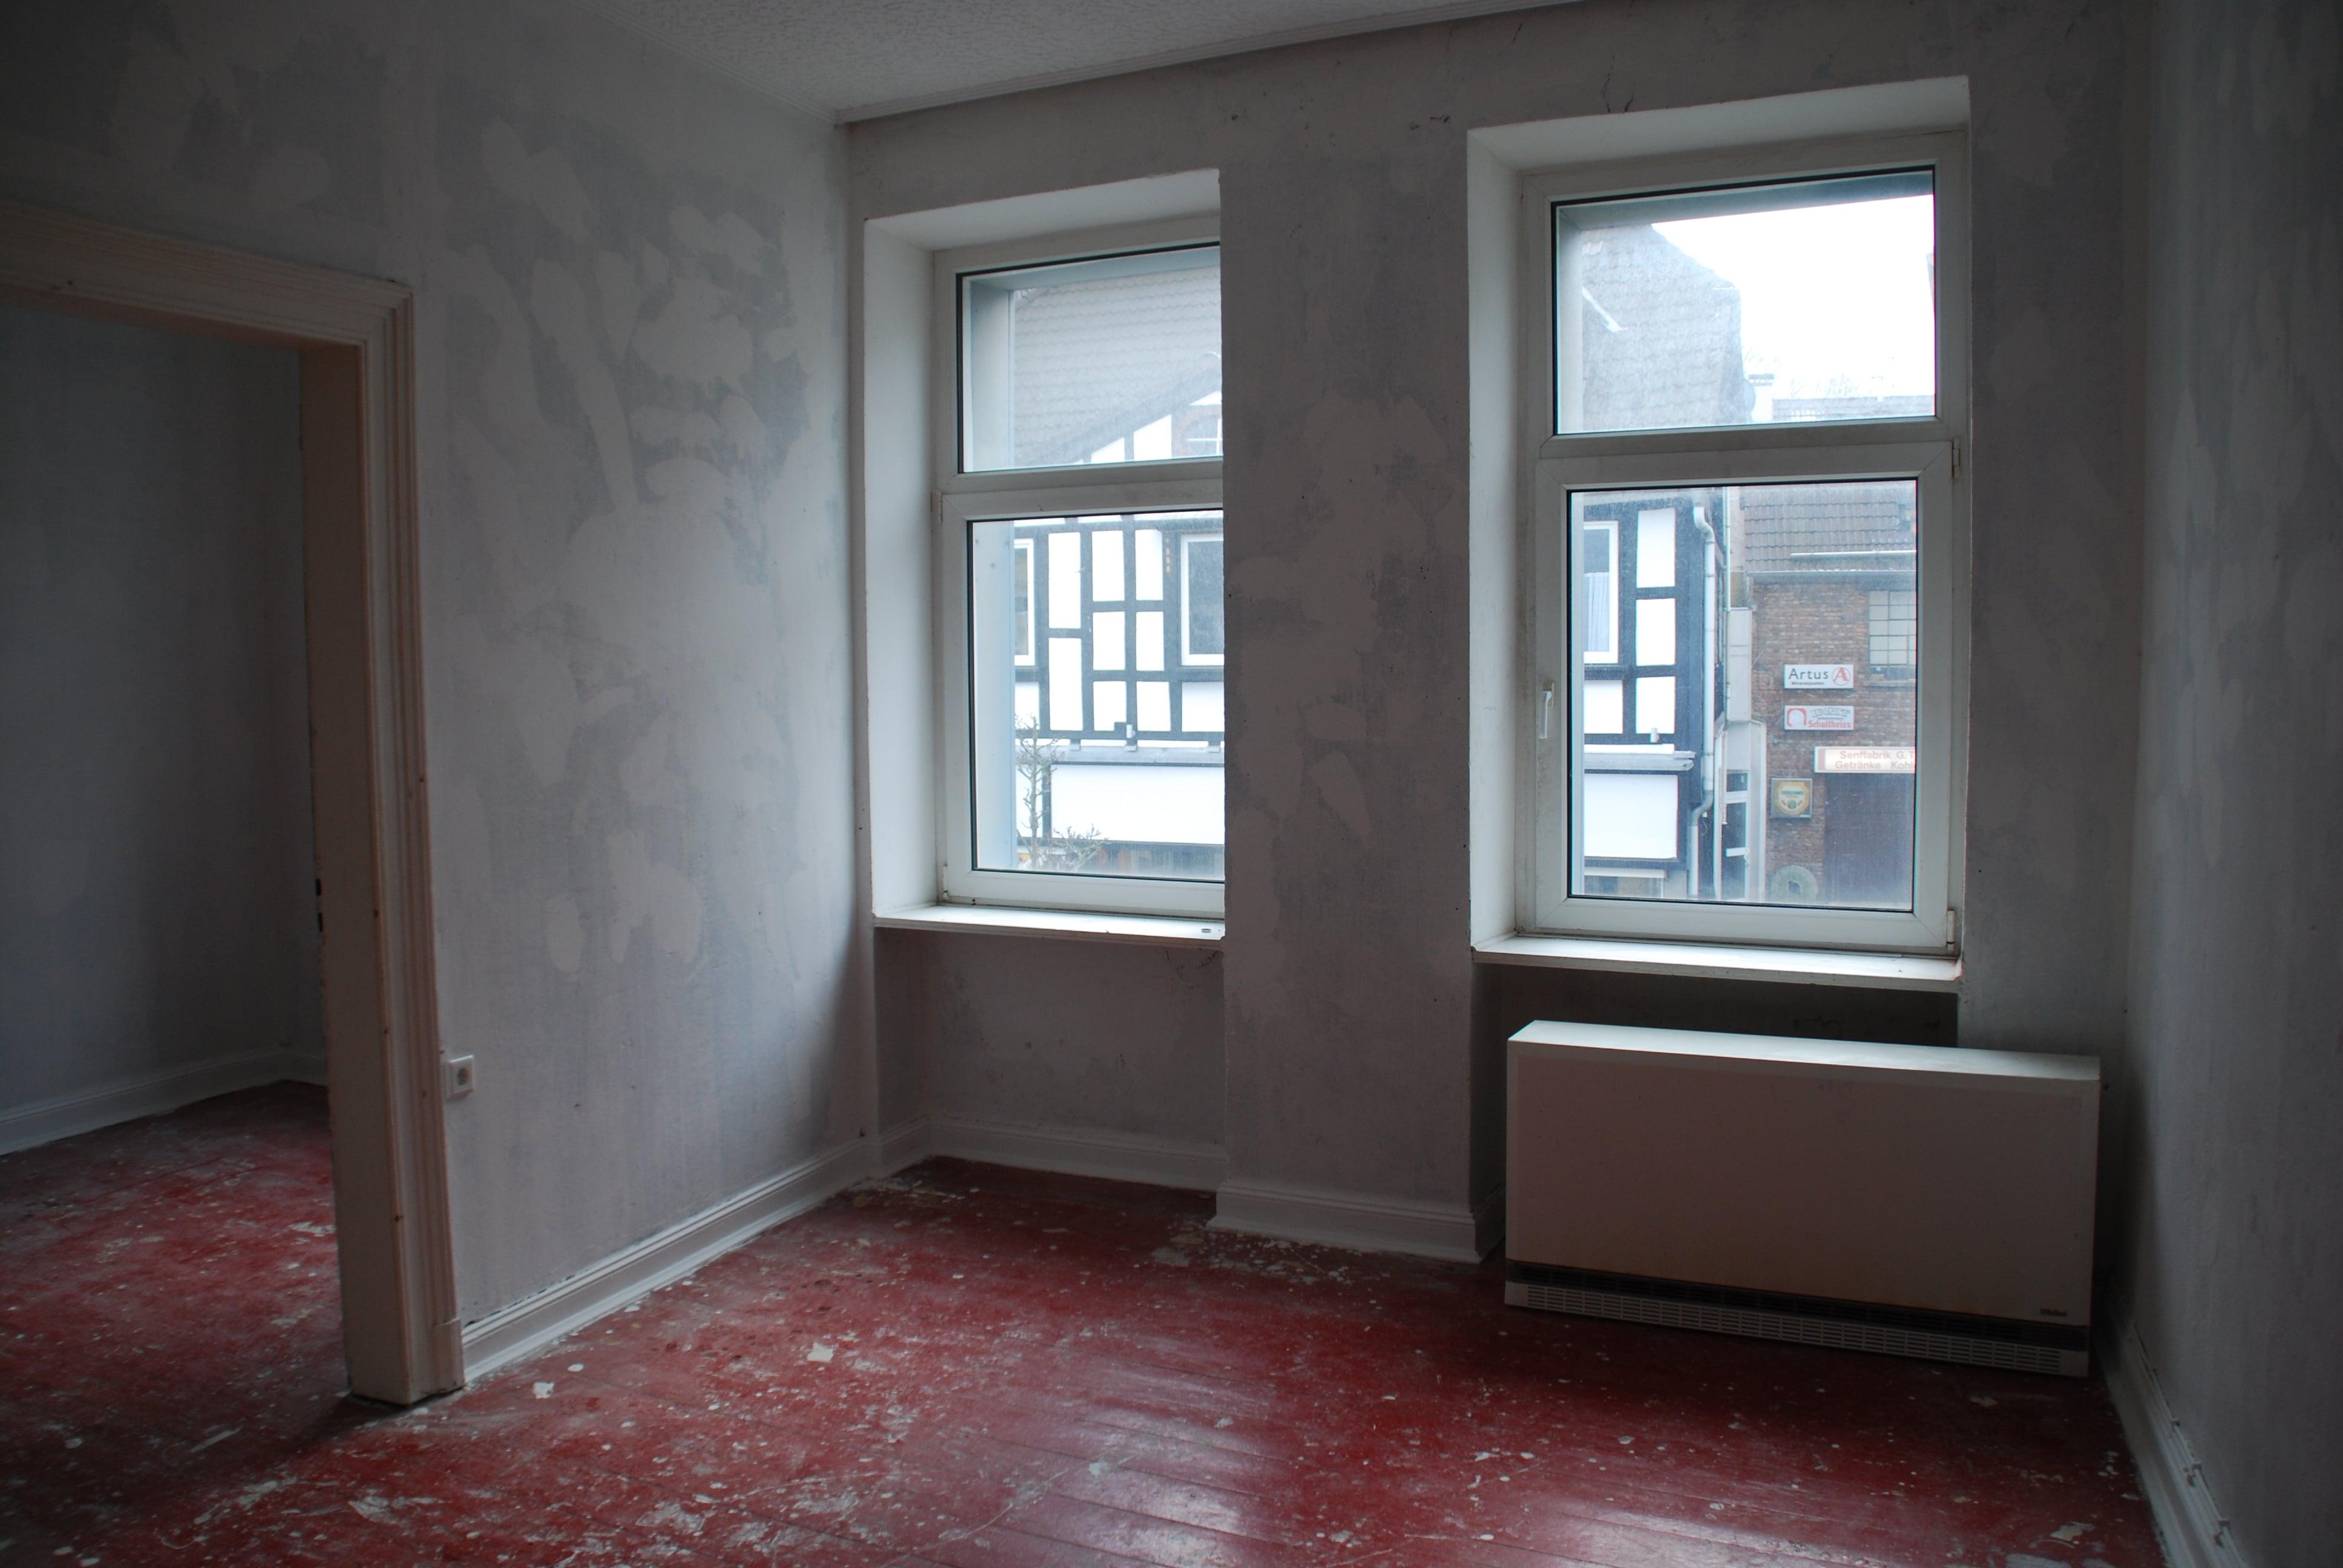 Saniertes Mehfamilienhaus in Iserlohn